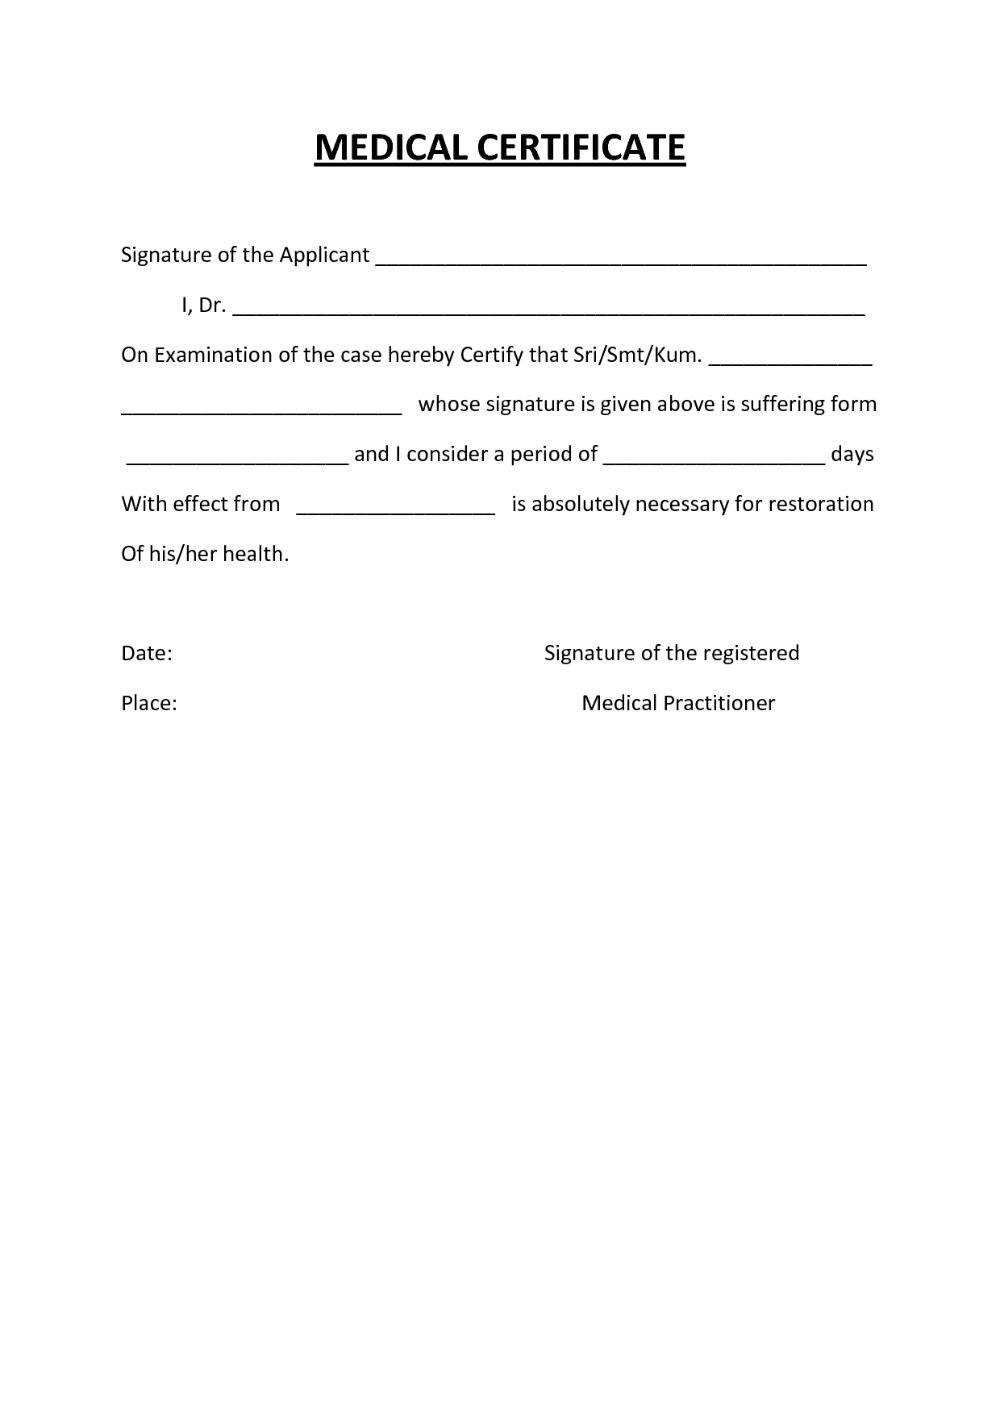 Fake Medical Certificate Template Download in 2020